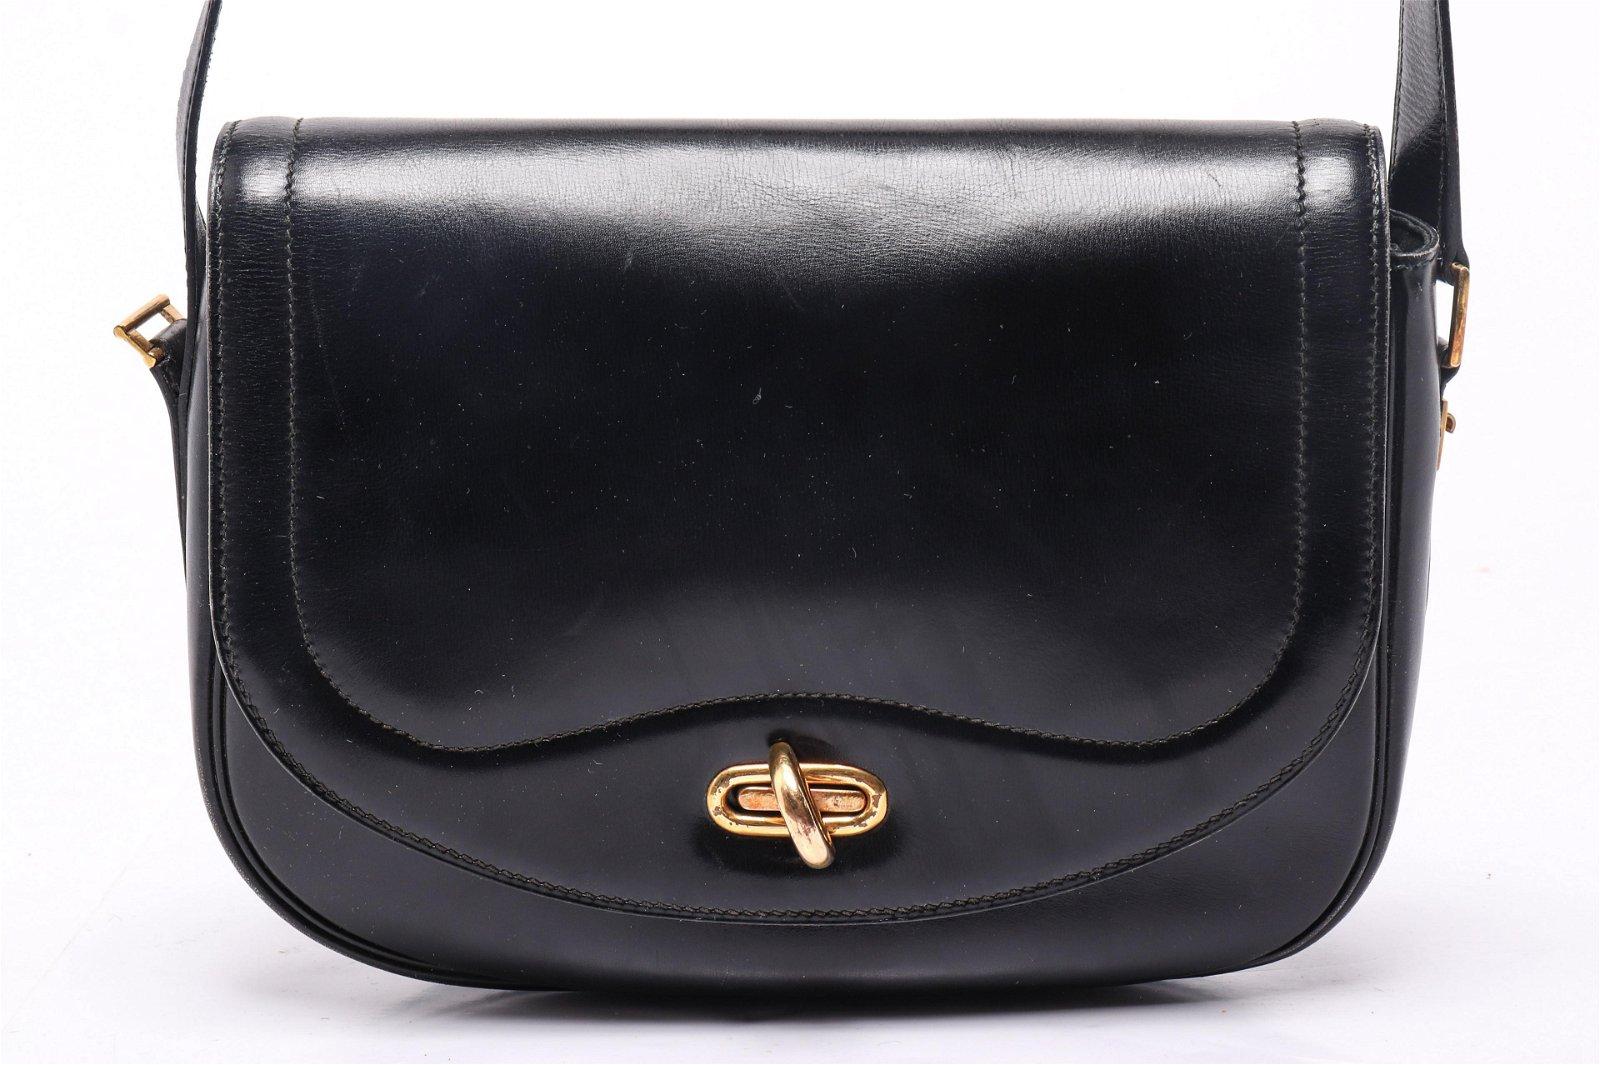 Hermes Sac Moto Black Leather Handbag